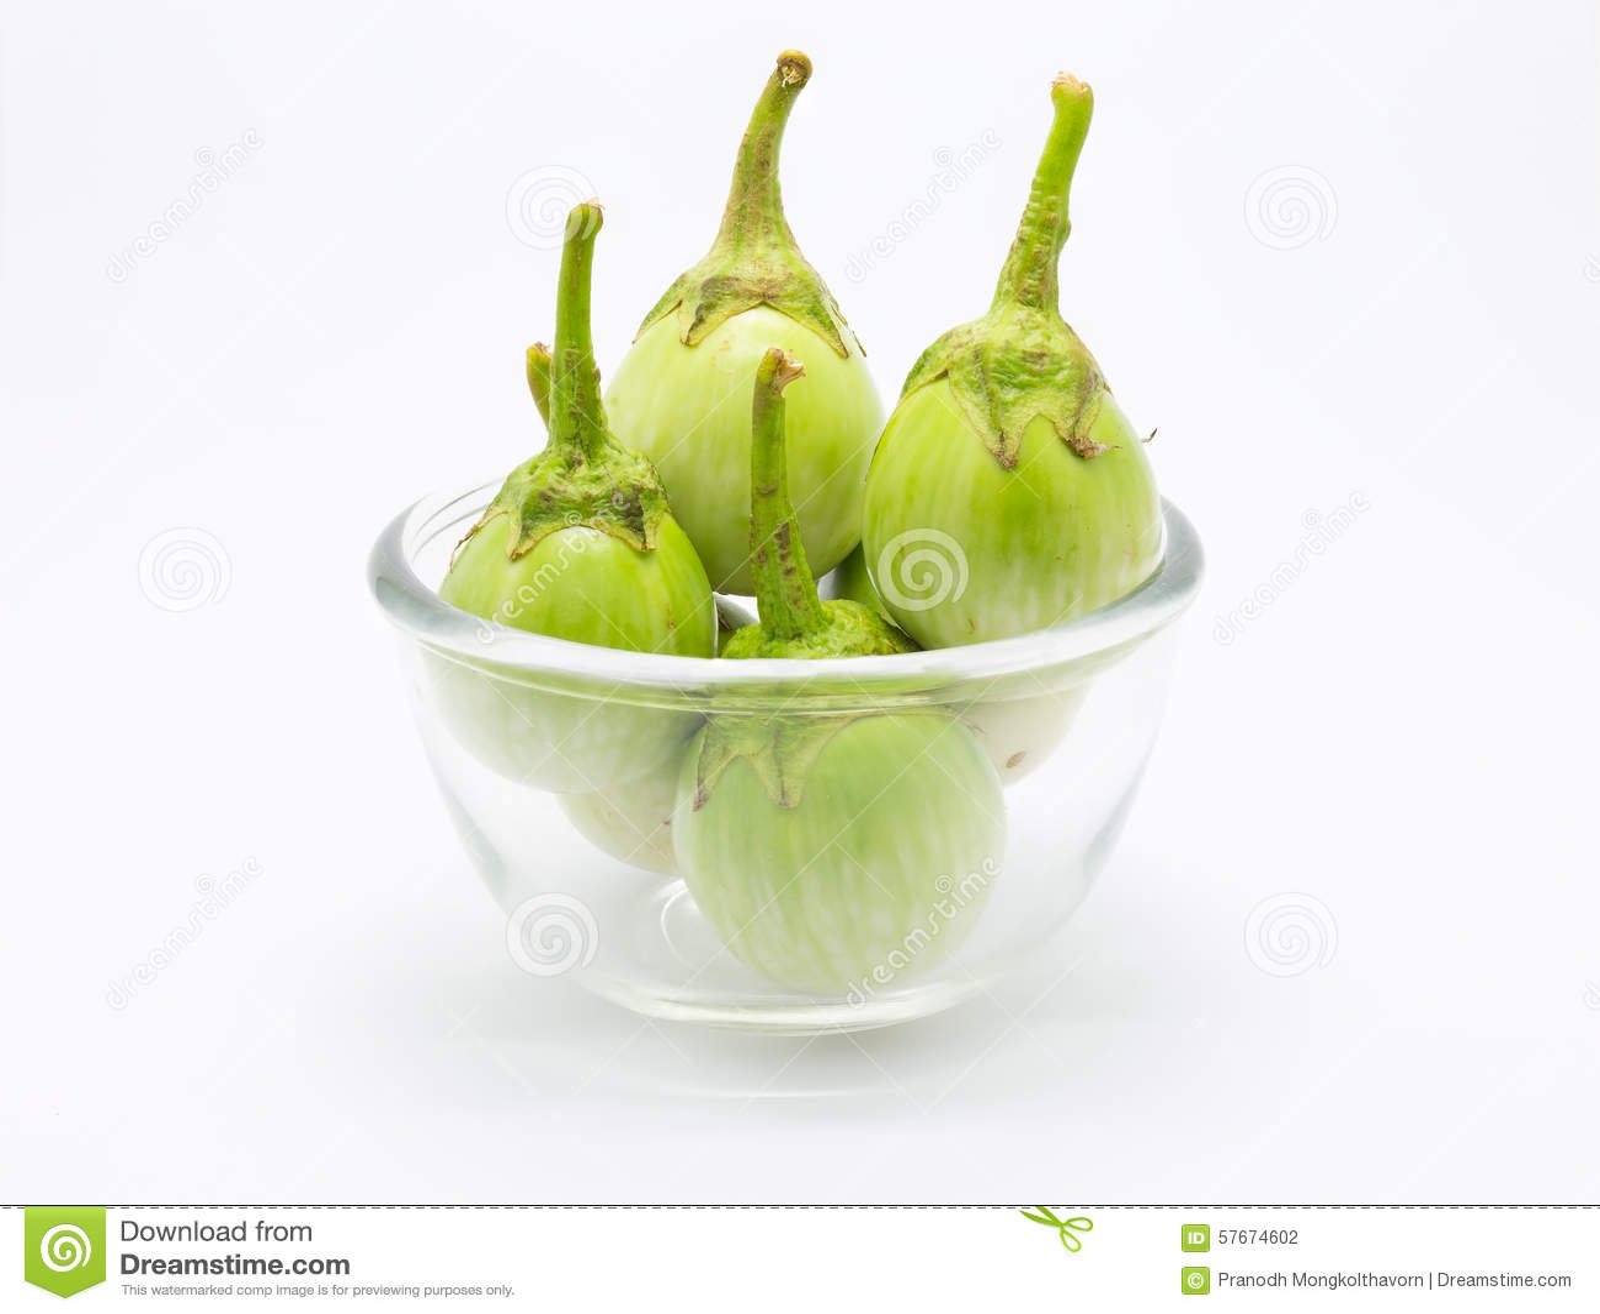 Schüssel grüne Aubergine